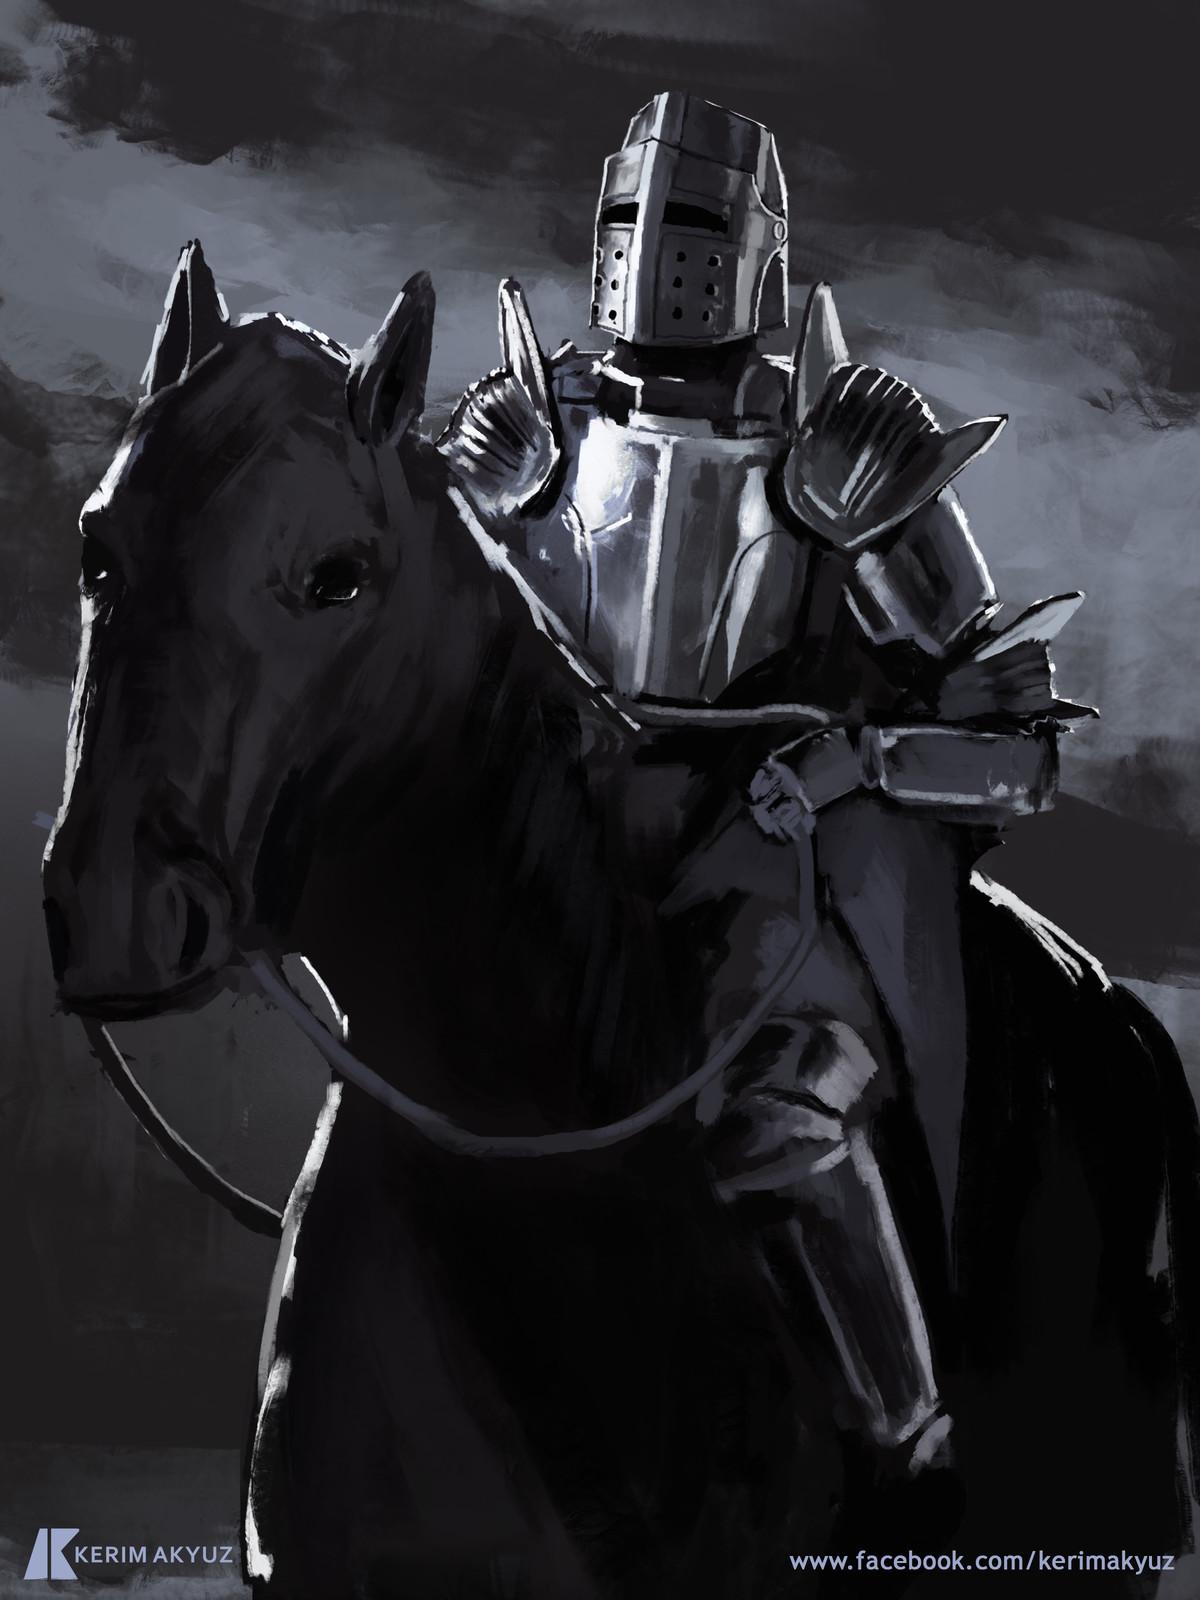 Daily Imagination #283 - Horseback